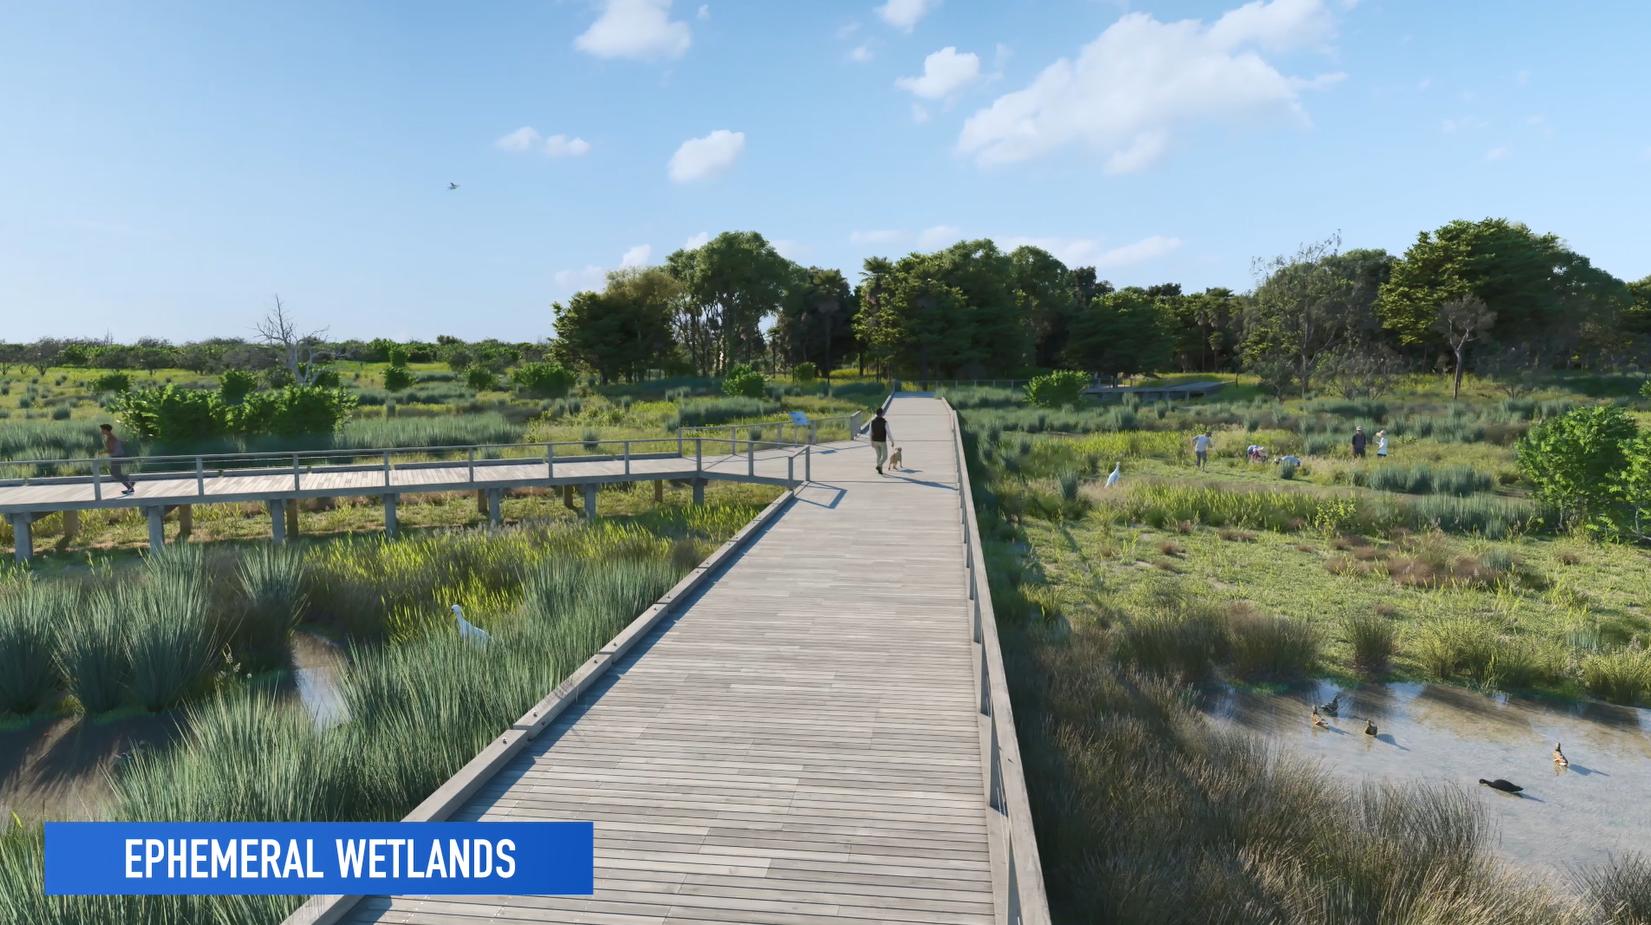 Ephemeral wetlands  boardwalk  community partnerships